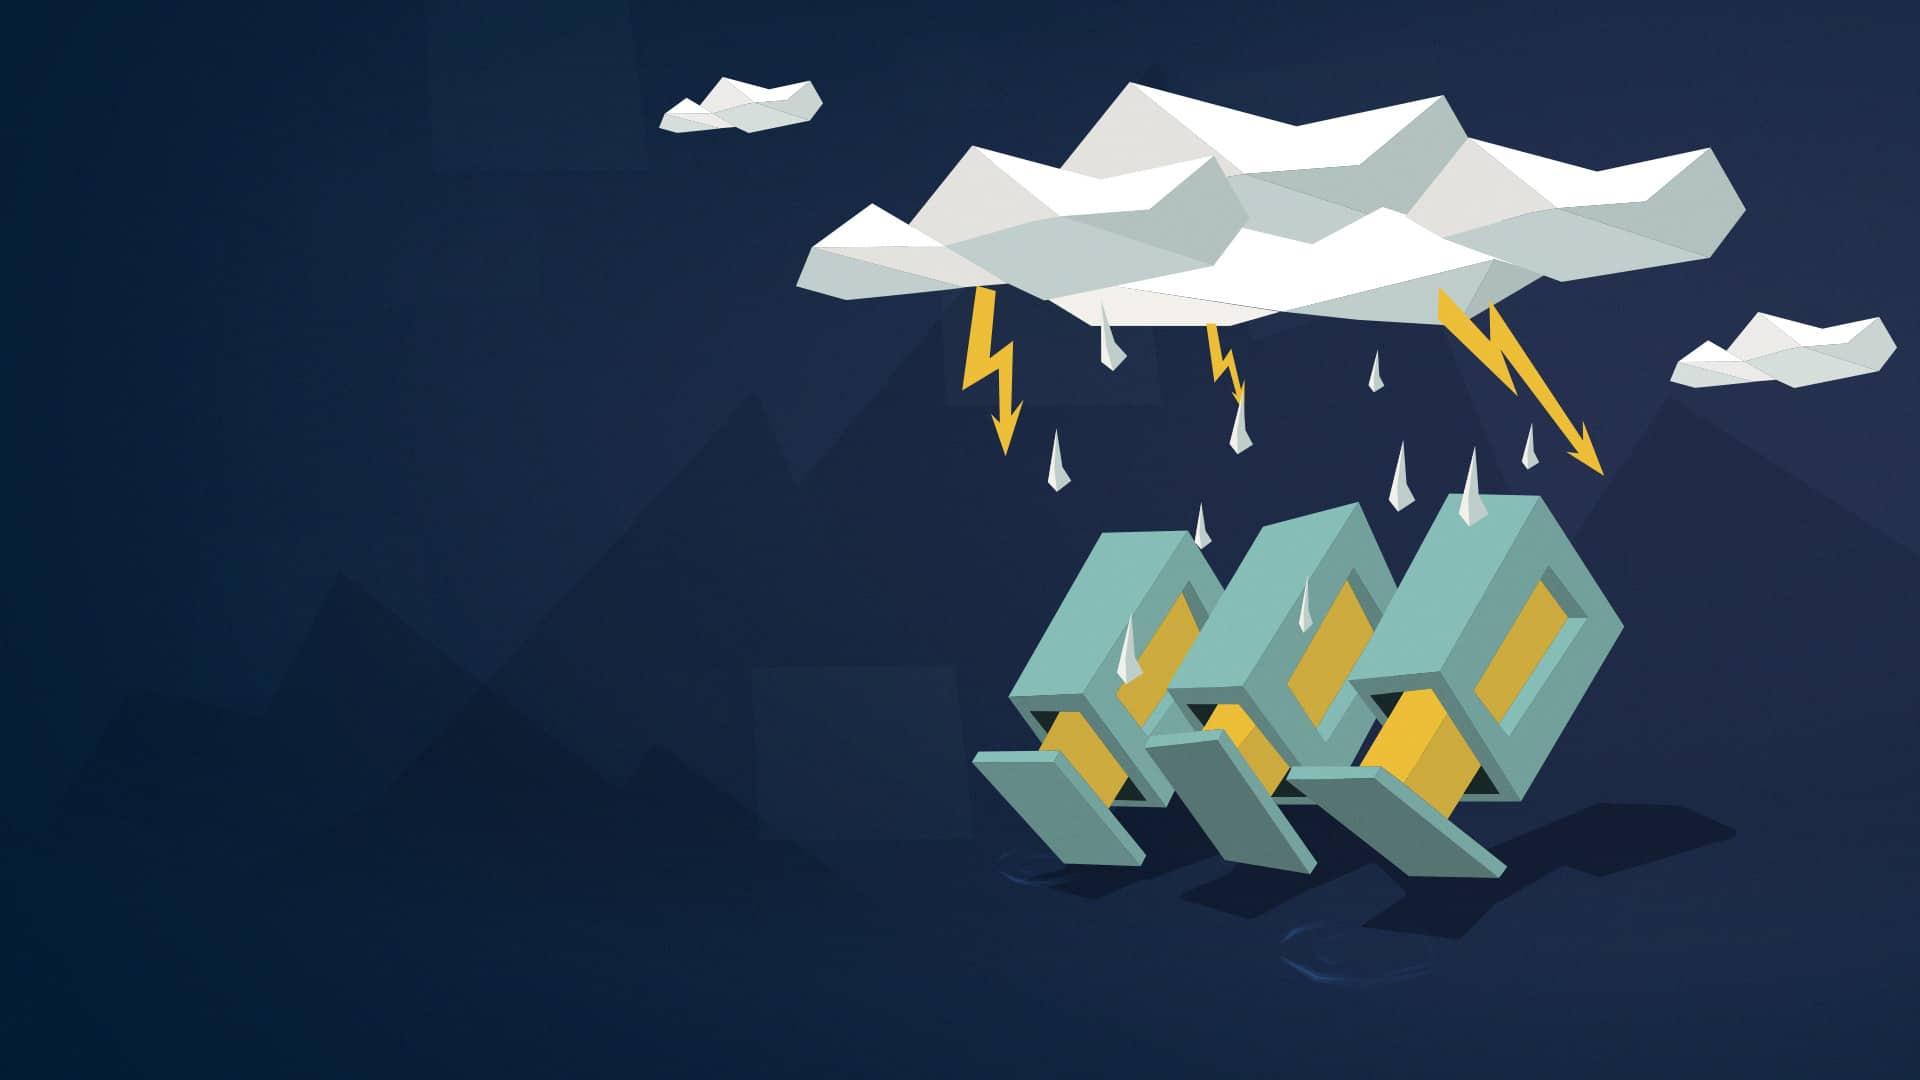 Dedikovany server v dobe cloudu